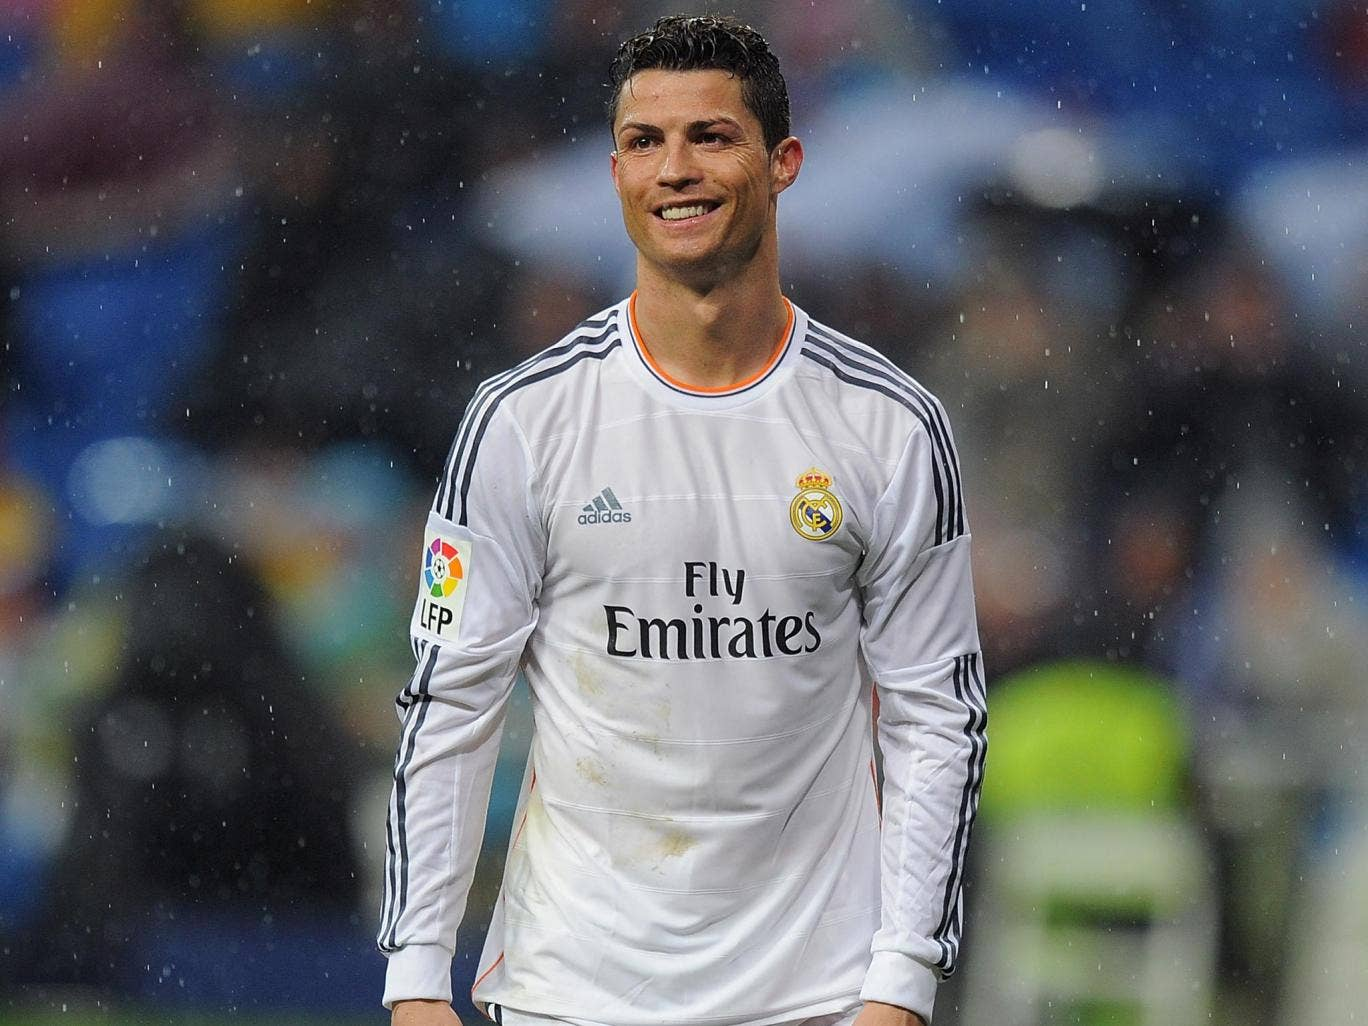 Cristiano Ronaldo during the 5-0 win over Rayo Vallecano